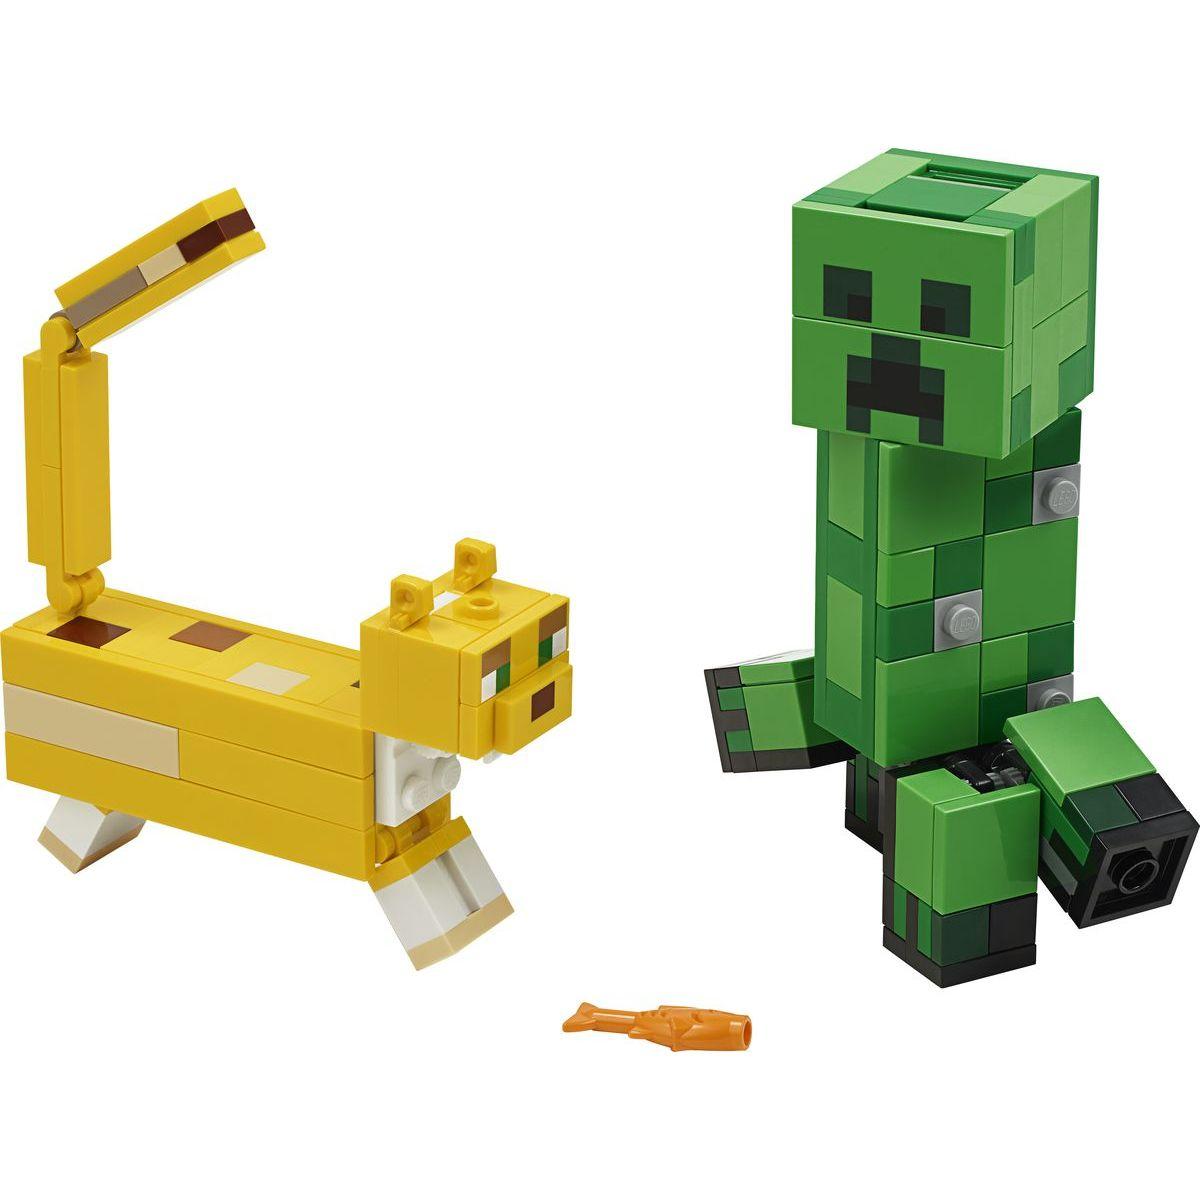 LEGO Minecraft 21156 Veľká figúrka: Creeper™ a Ocelot